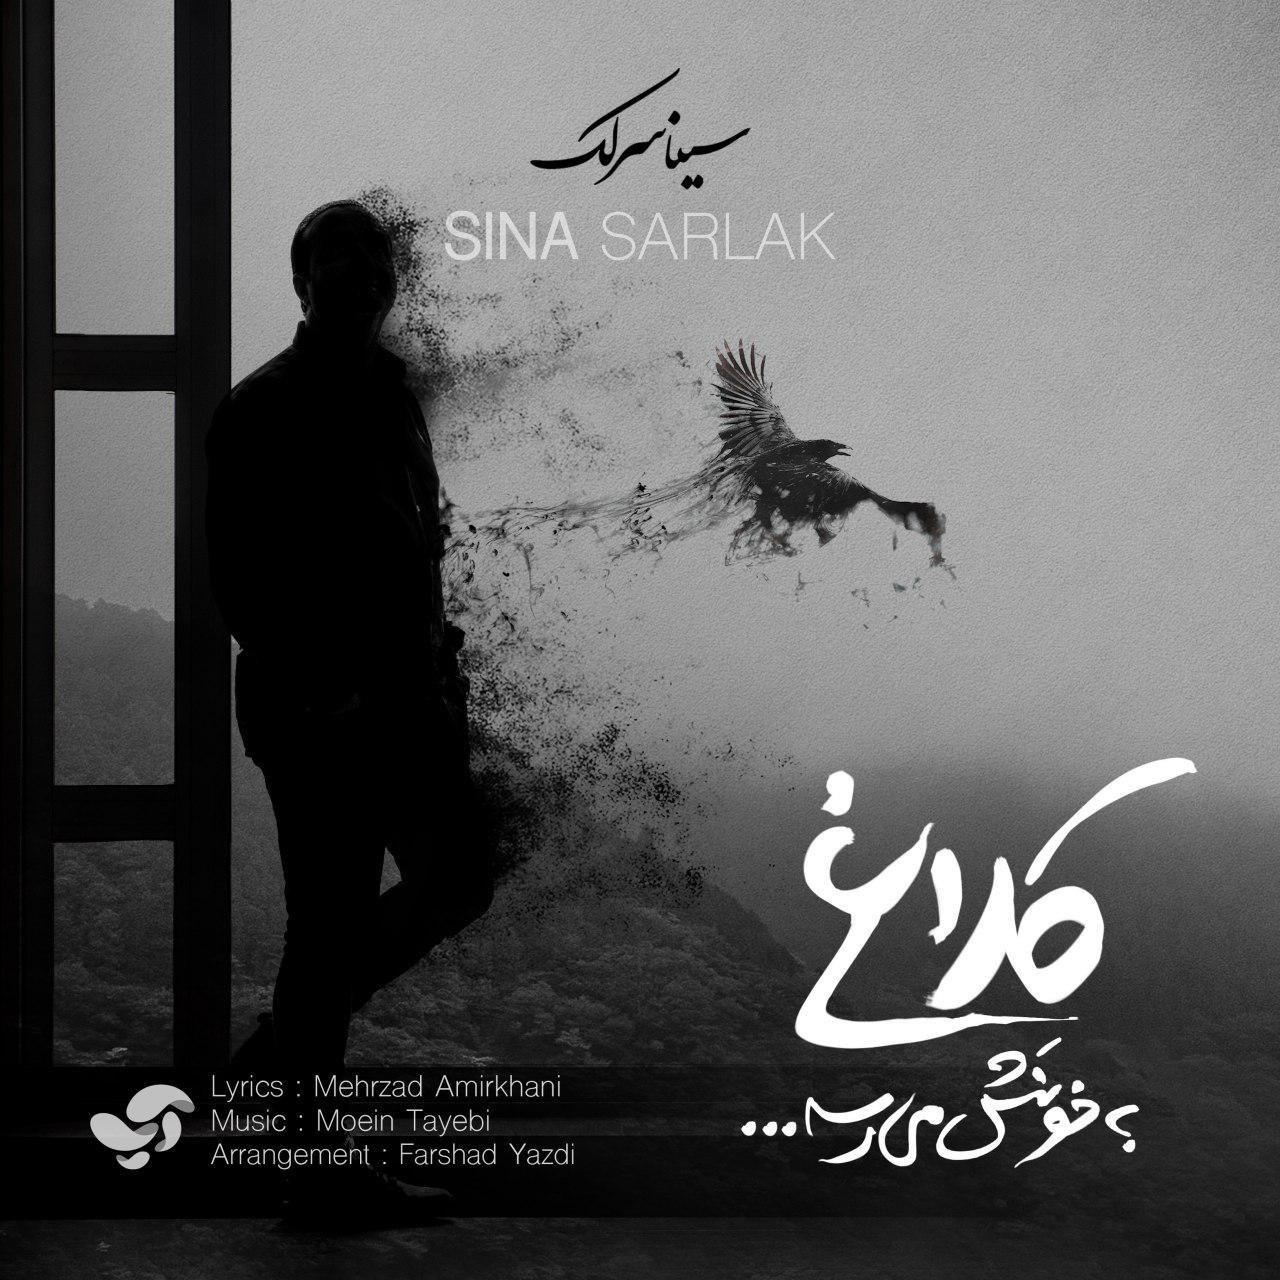 Sina Sarlak – Kalagh Be Khoonash Mirese